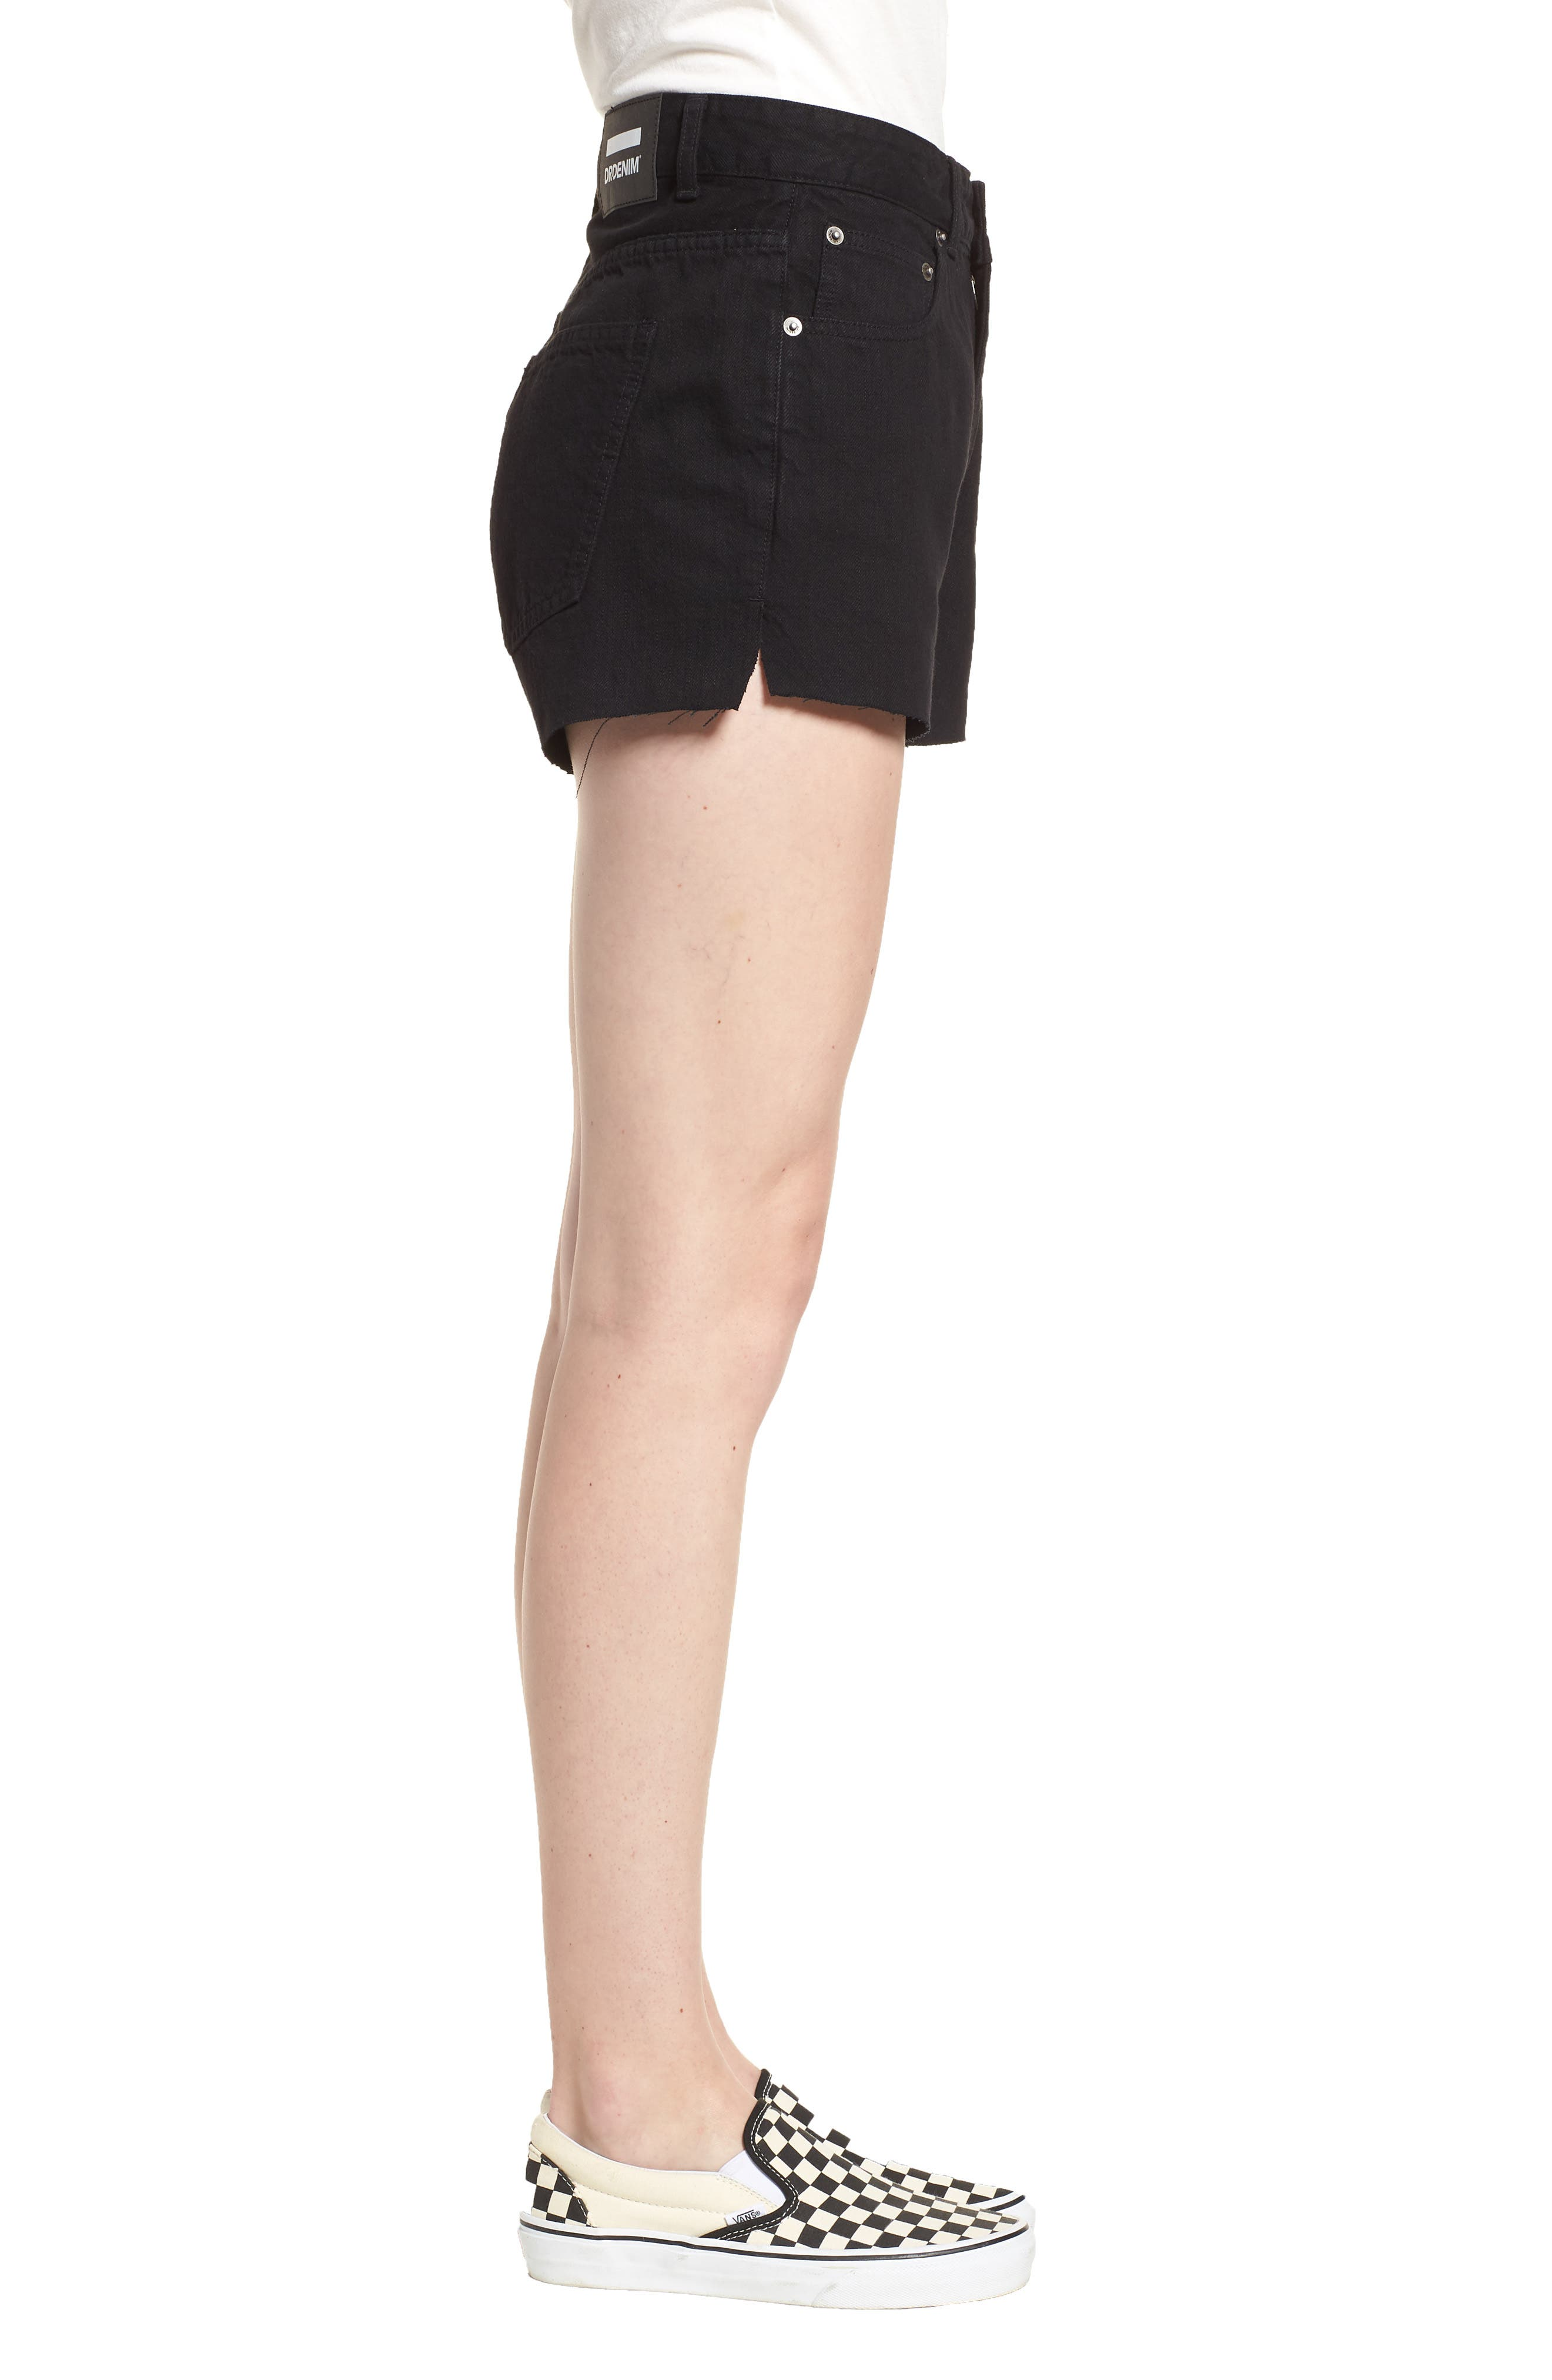 Vega Denim Shorts,                             Alternate thumbnail 3, color,                             001